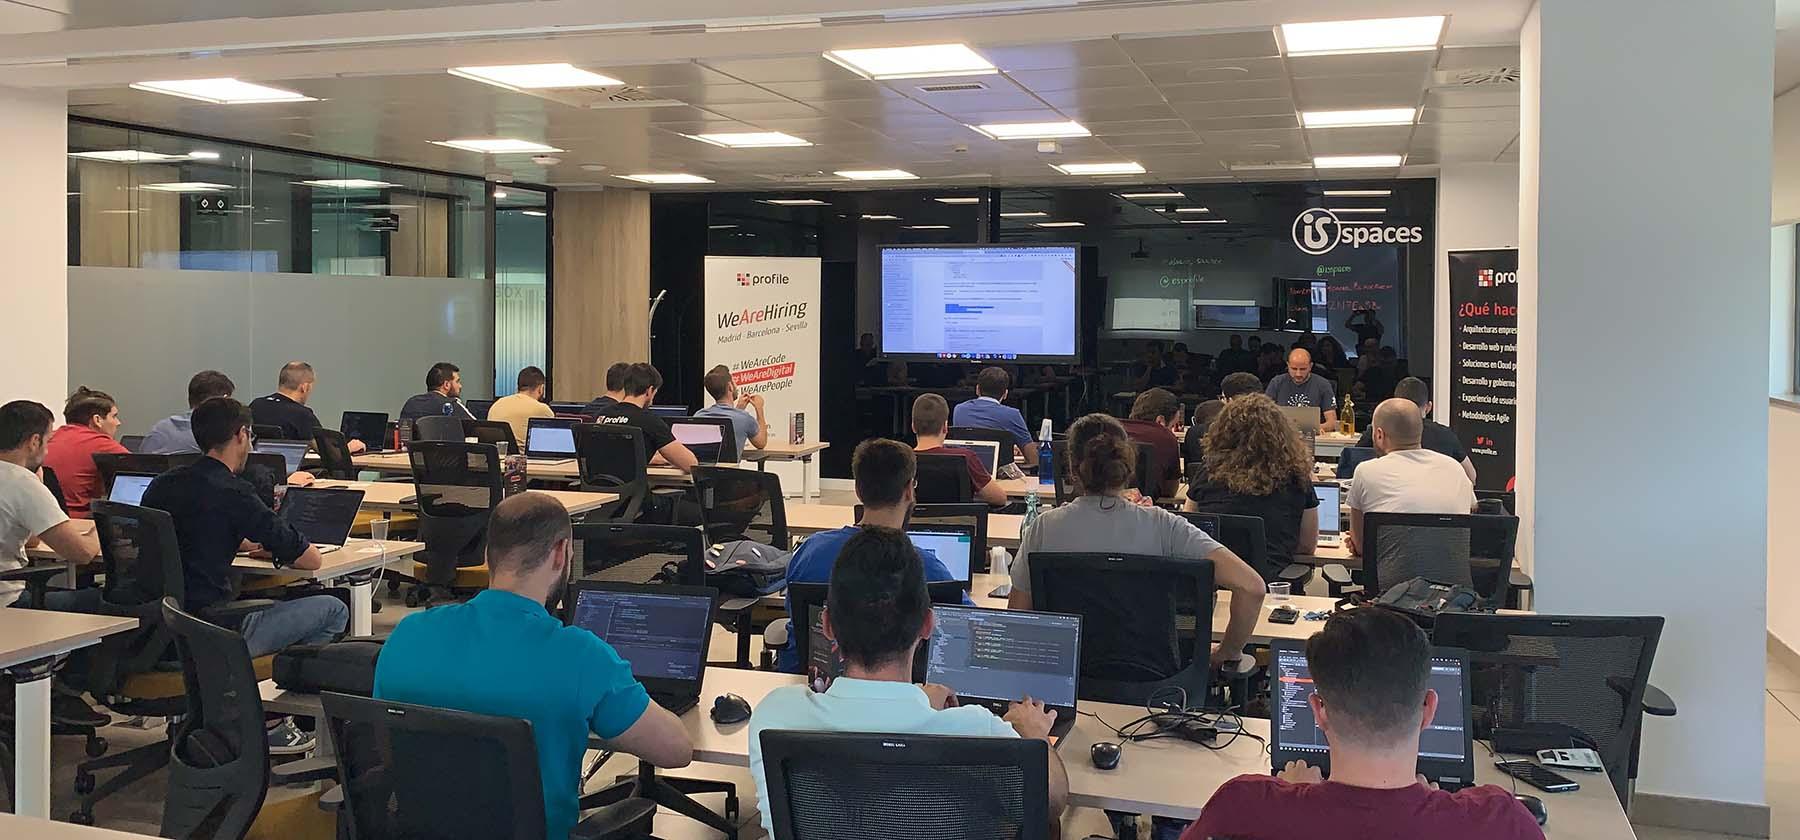 Foto de la sala llena para el taller de Micronaut en Profile Sevilla